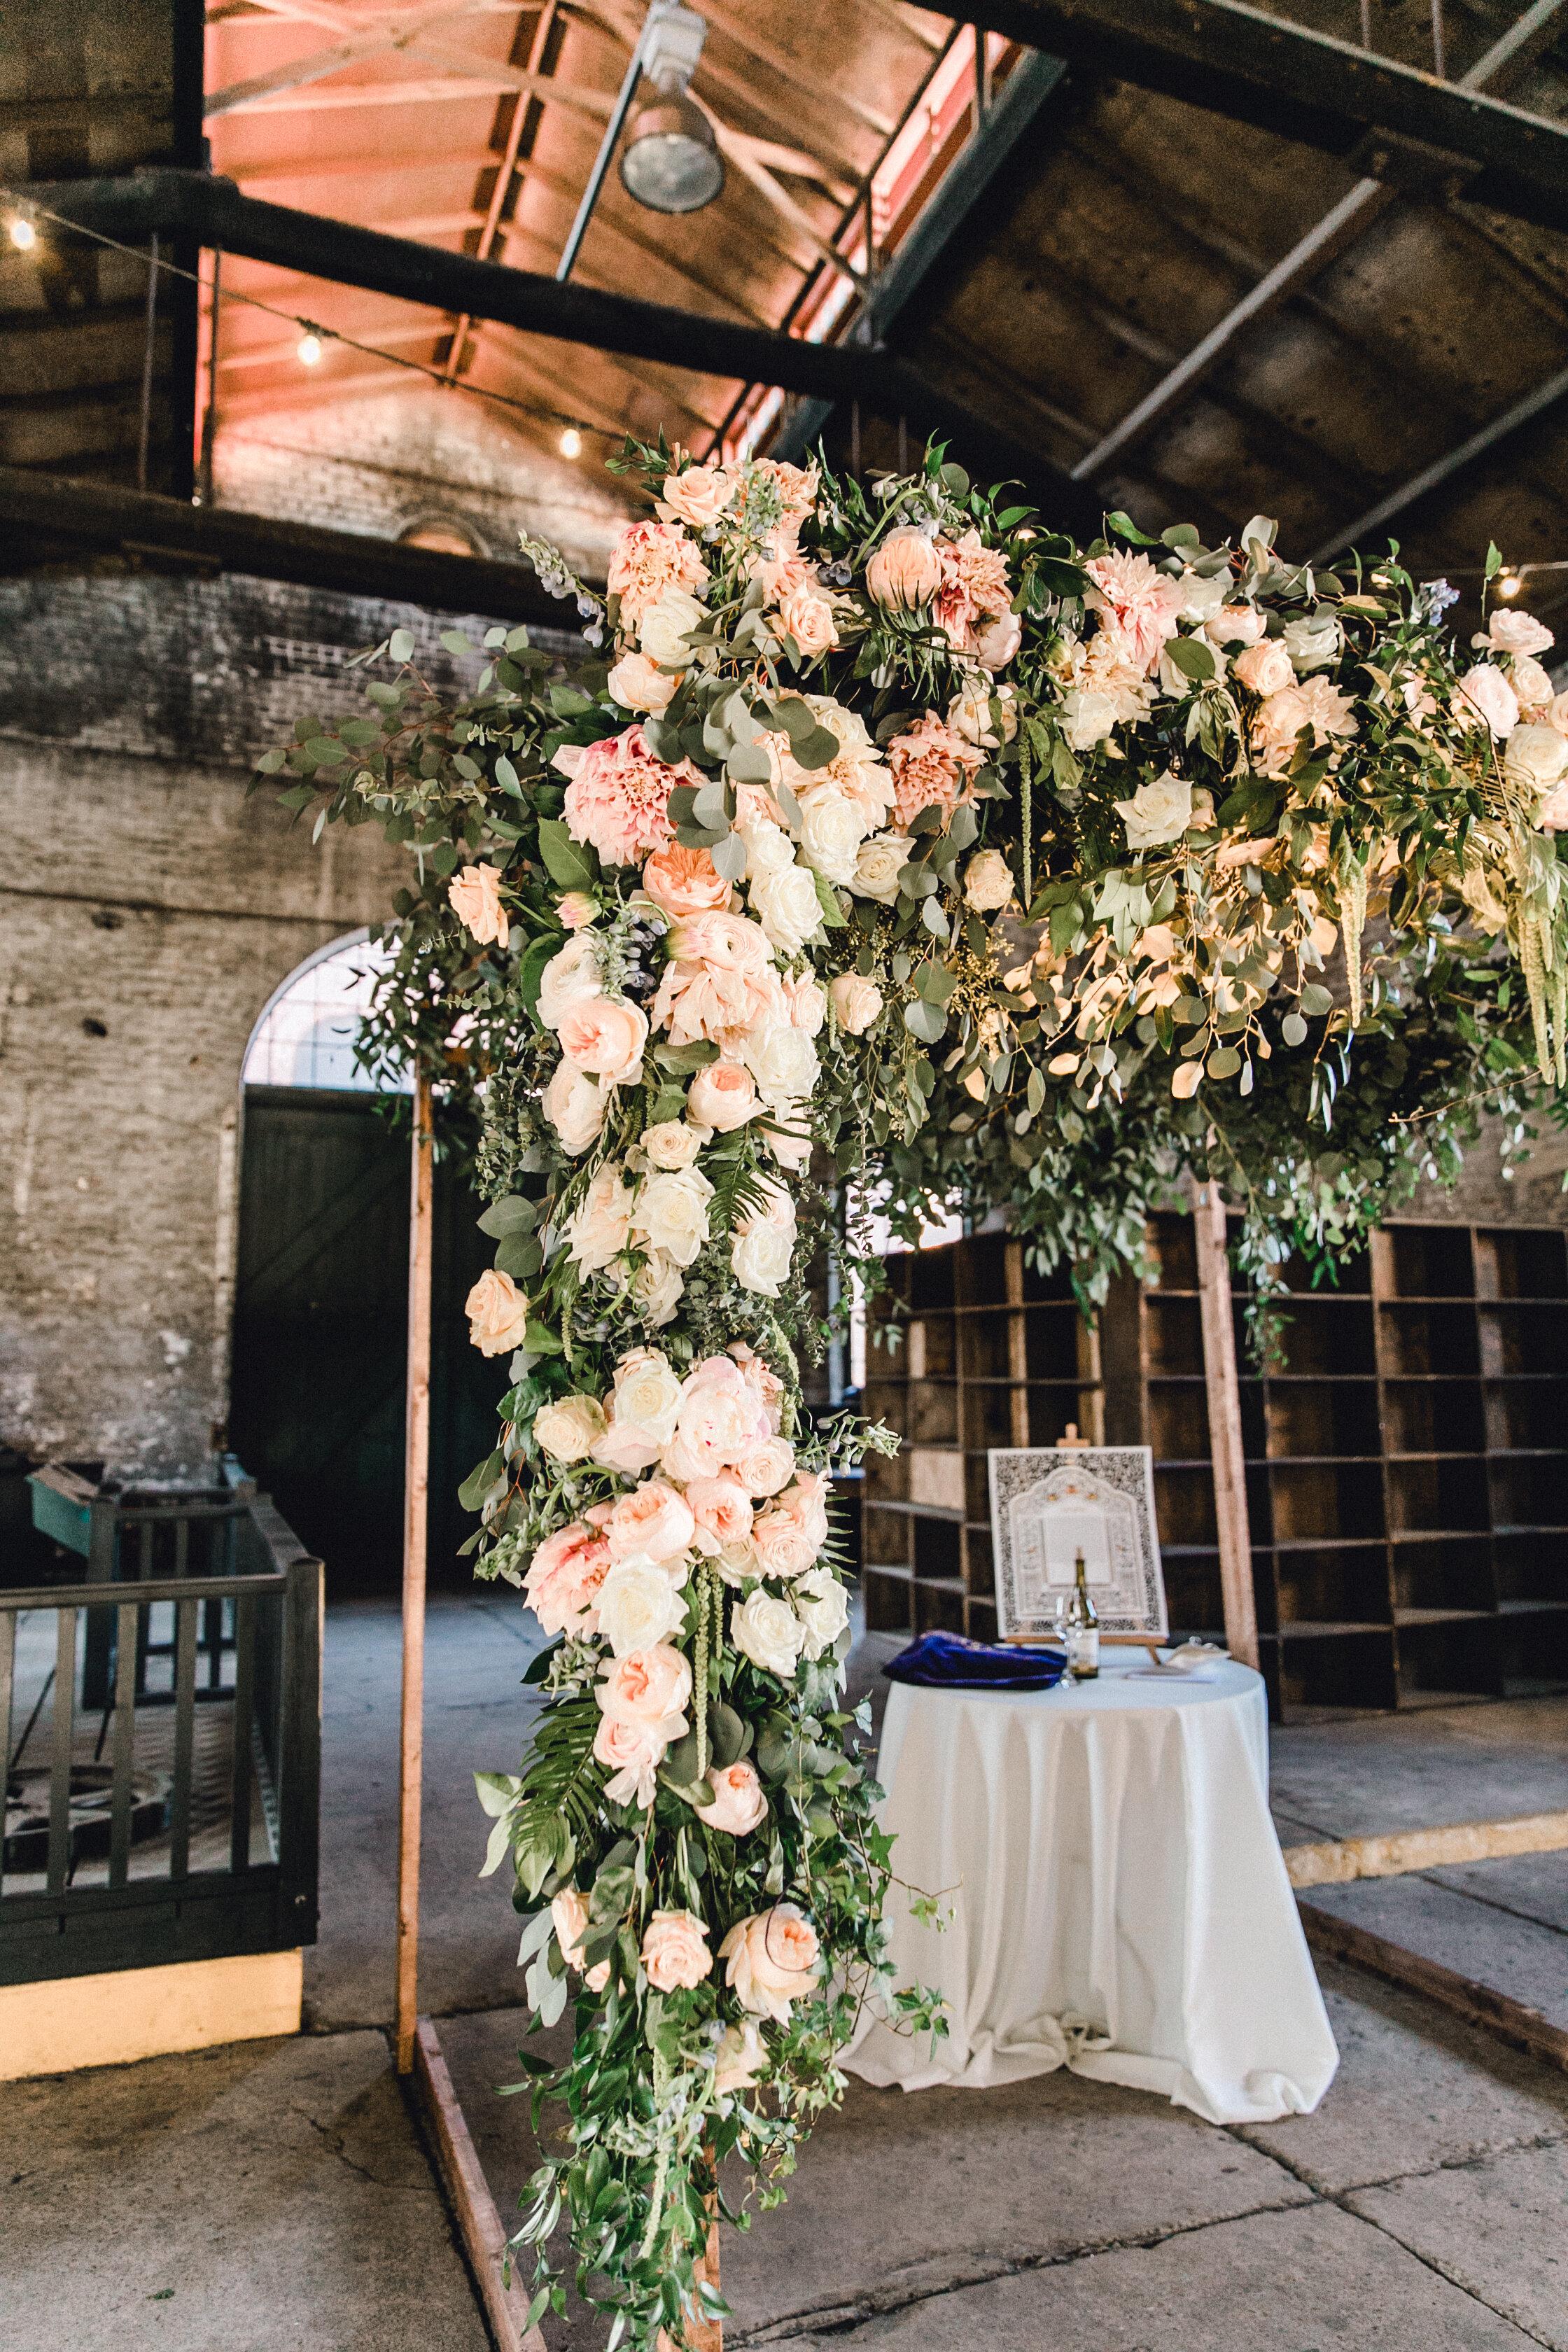 ivory-and-beau-blog-weddings-ivory-and-beau-couple-dominique-and-andres-savannah-florist-wedding-planning-savannah-bridal-boutique-wedding-flowers-KIP_WEBERWEDDING_RAILROADMUSEUM-940.JPG